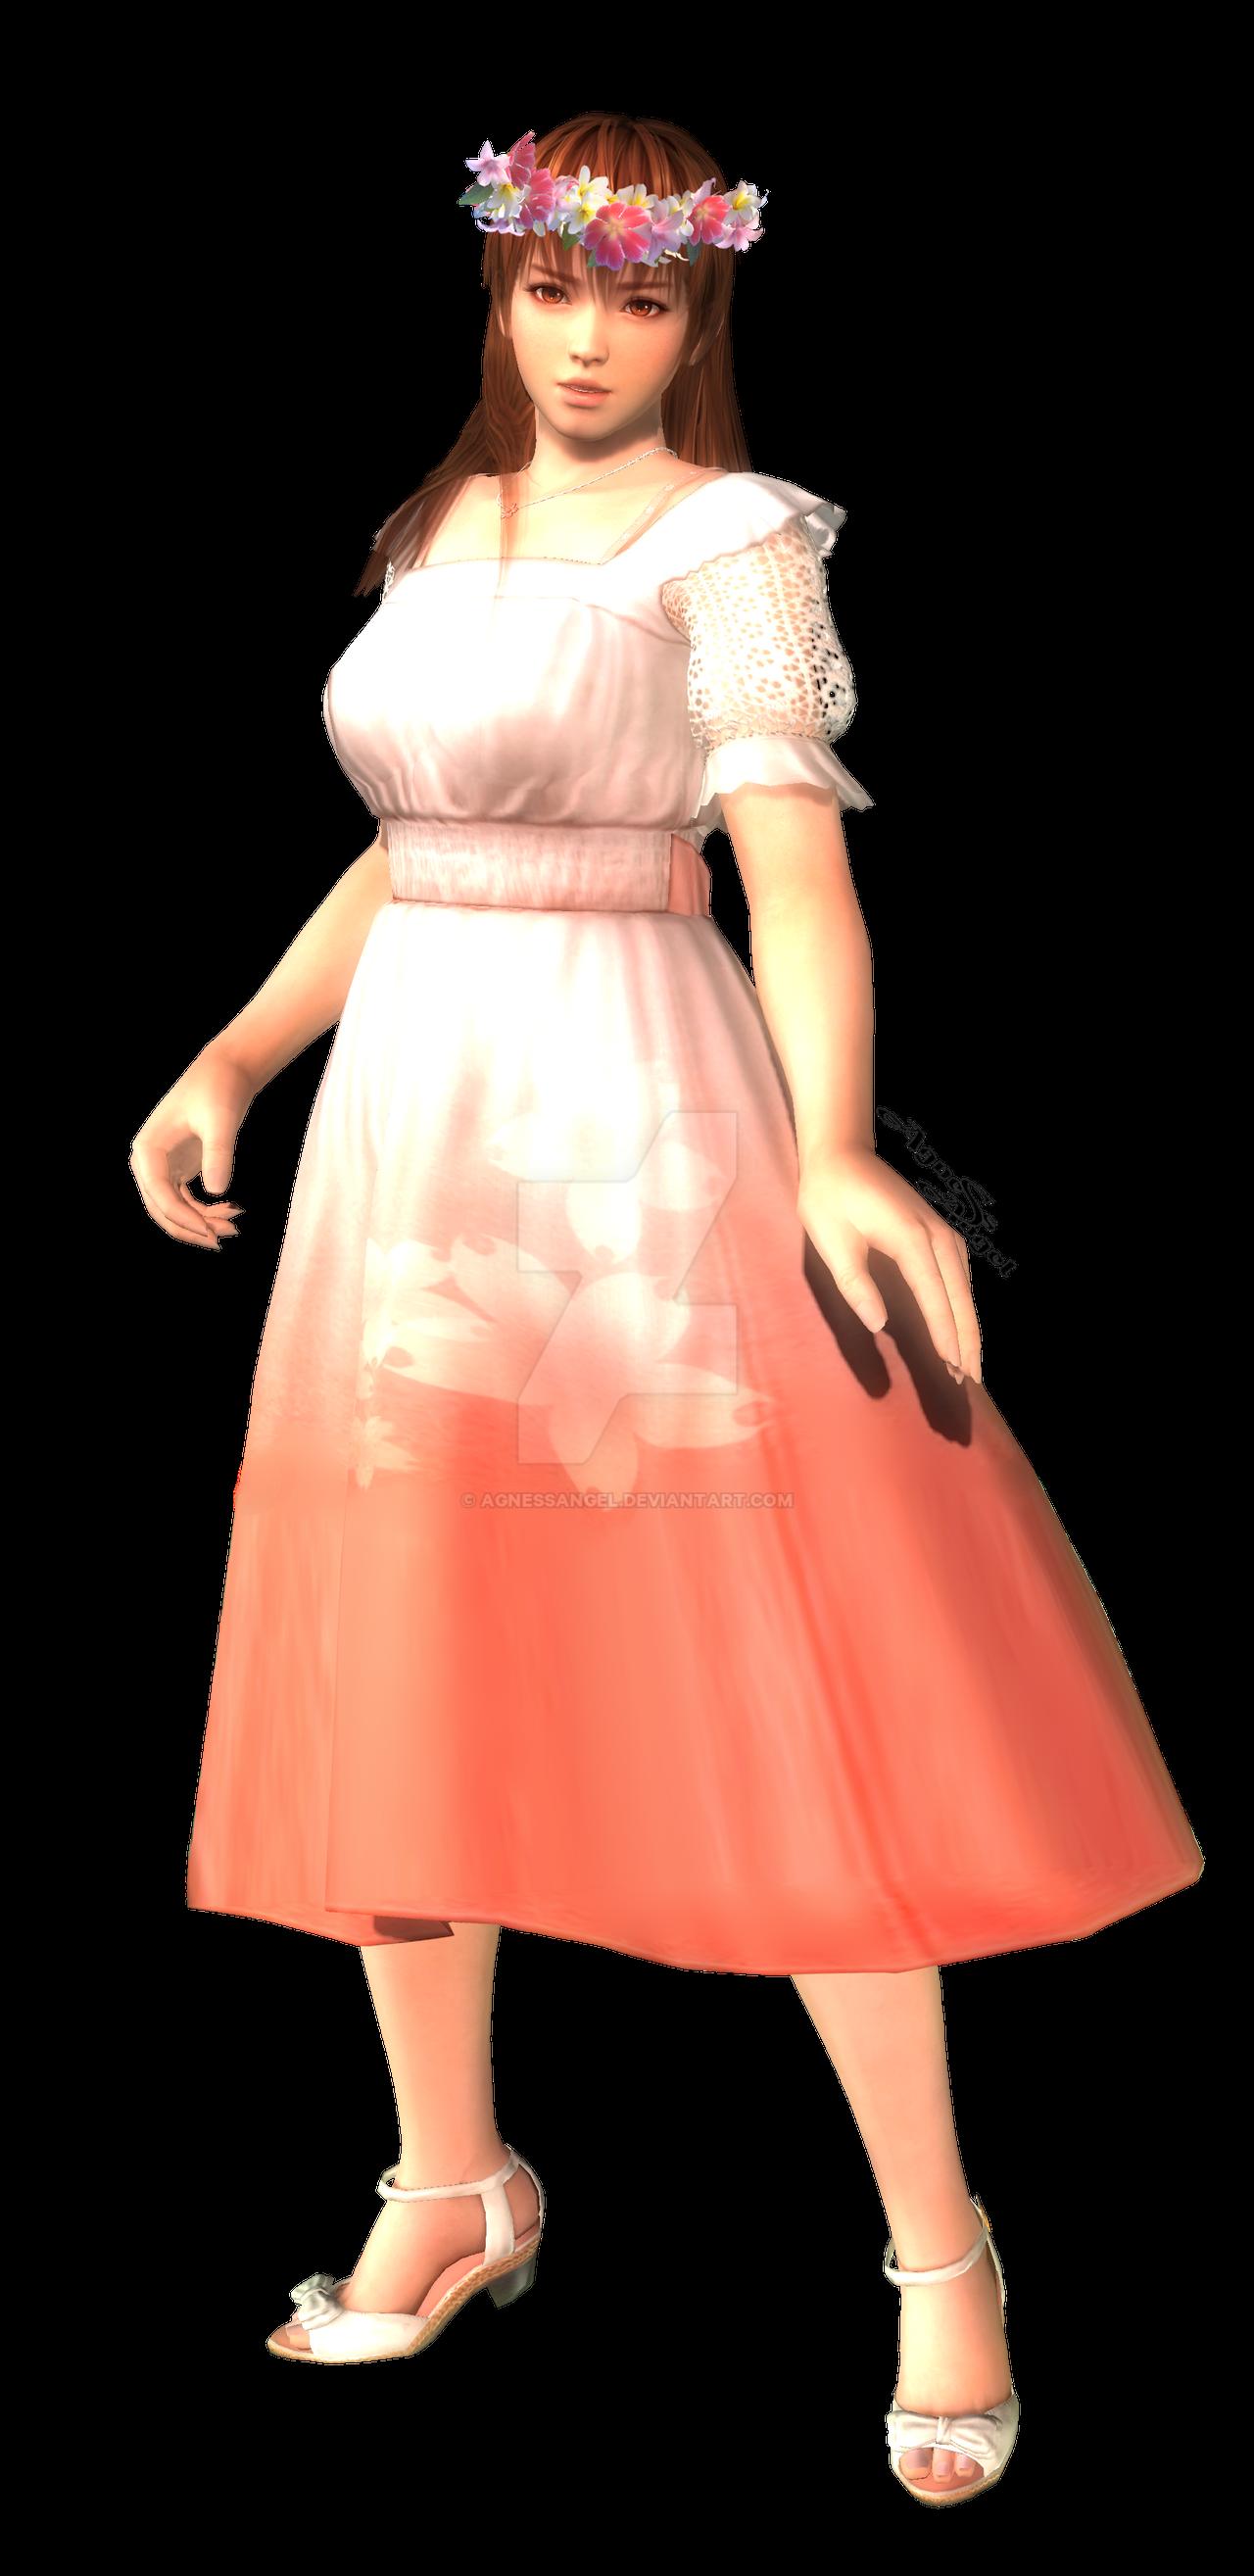 Kasumi in flower crown transparent png by AgnessAngel on DeviantArt